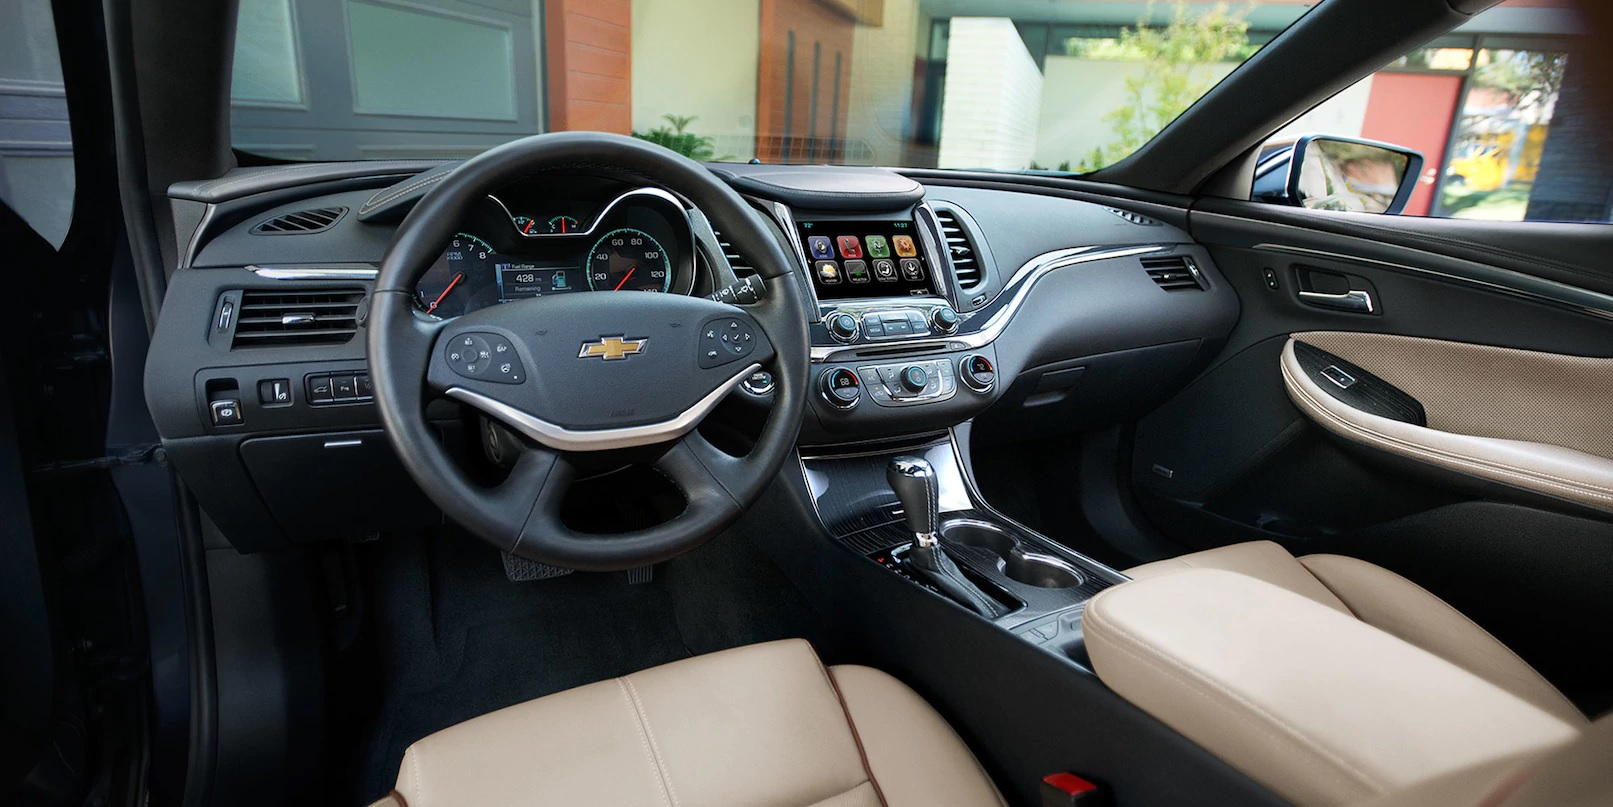 2018 Chevrolet Impala Financing in Chicago, IL - Kingdom Chevy